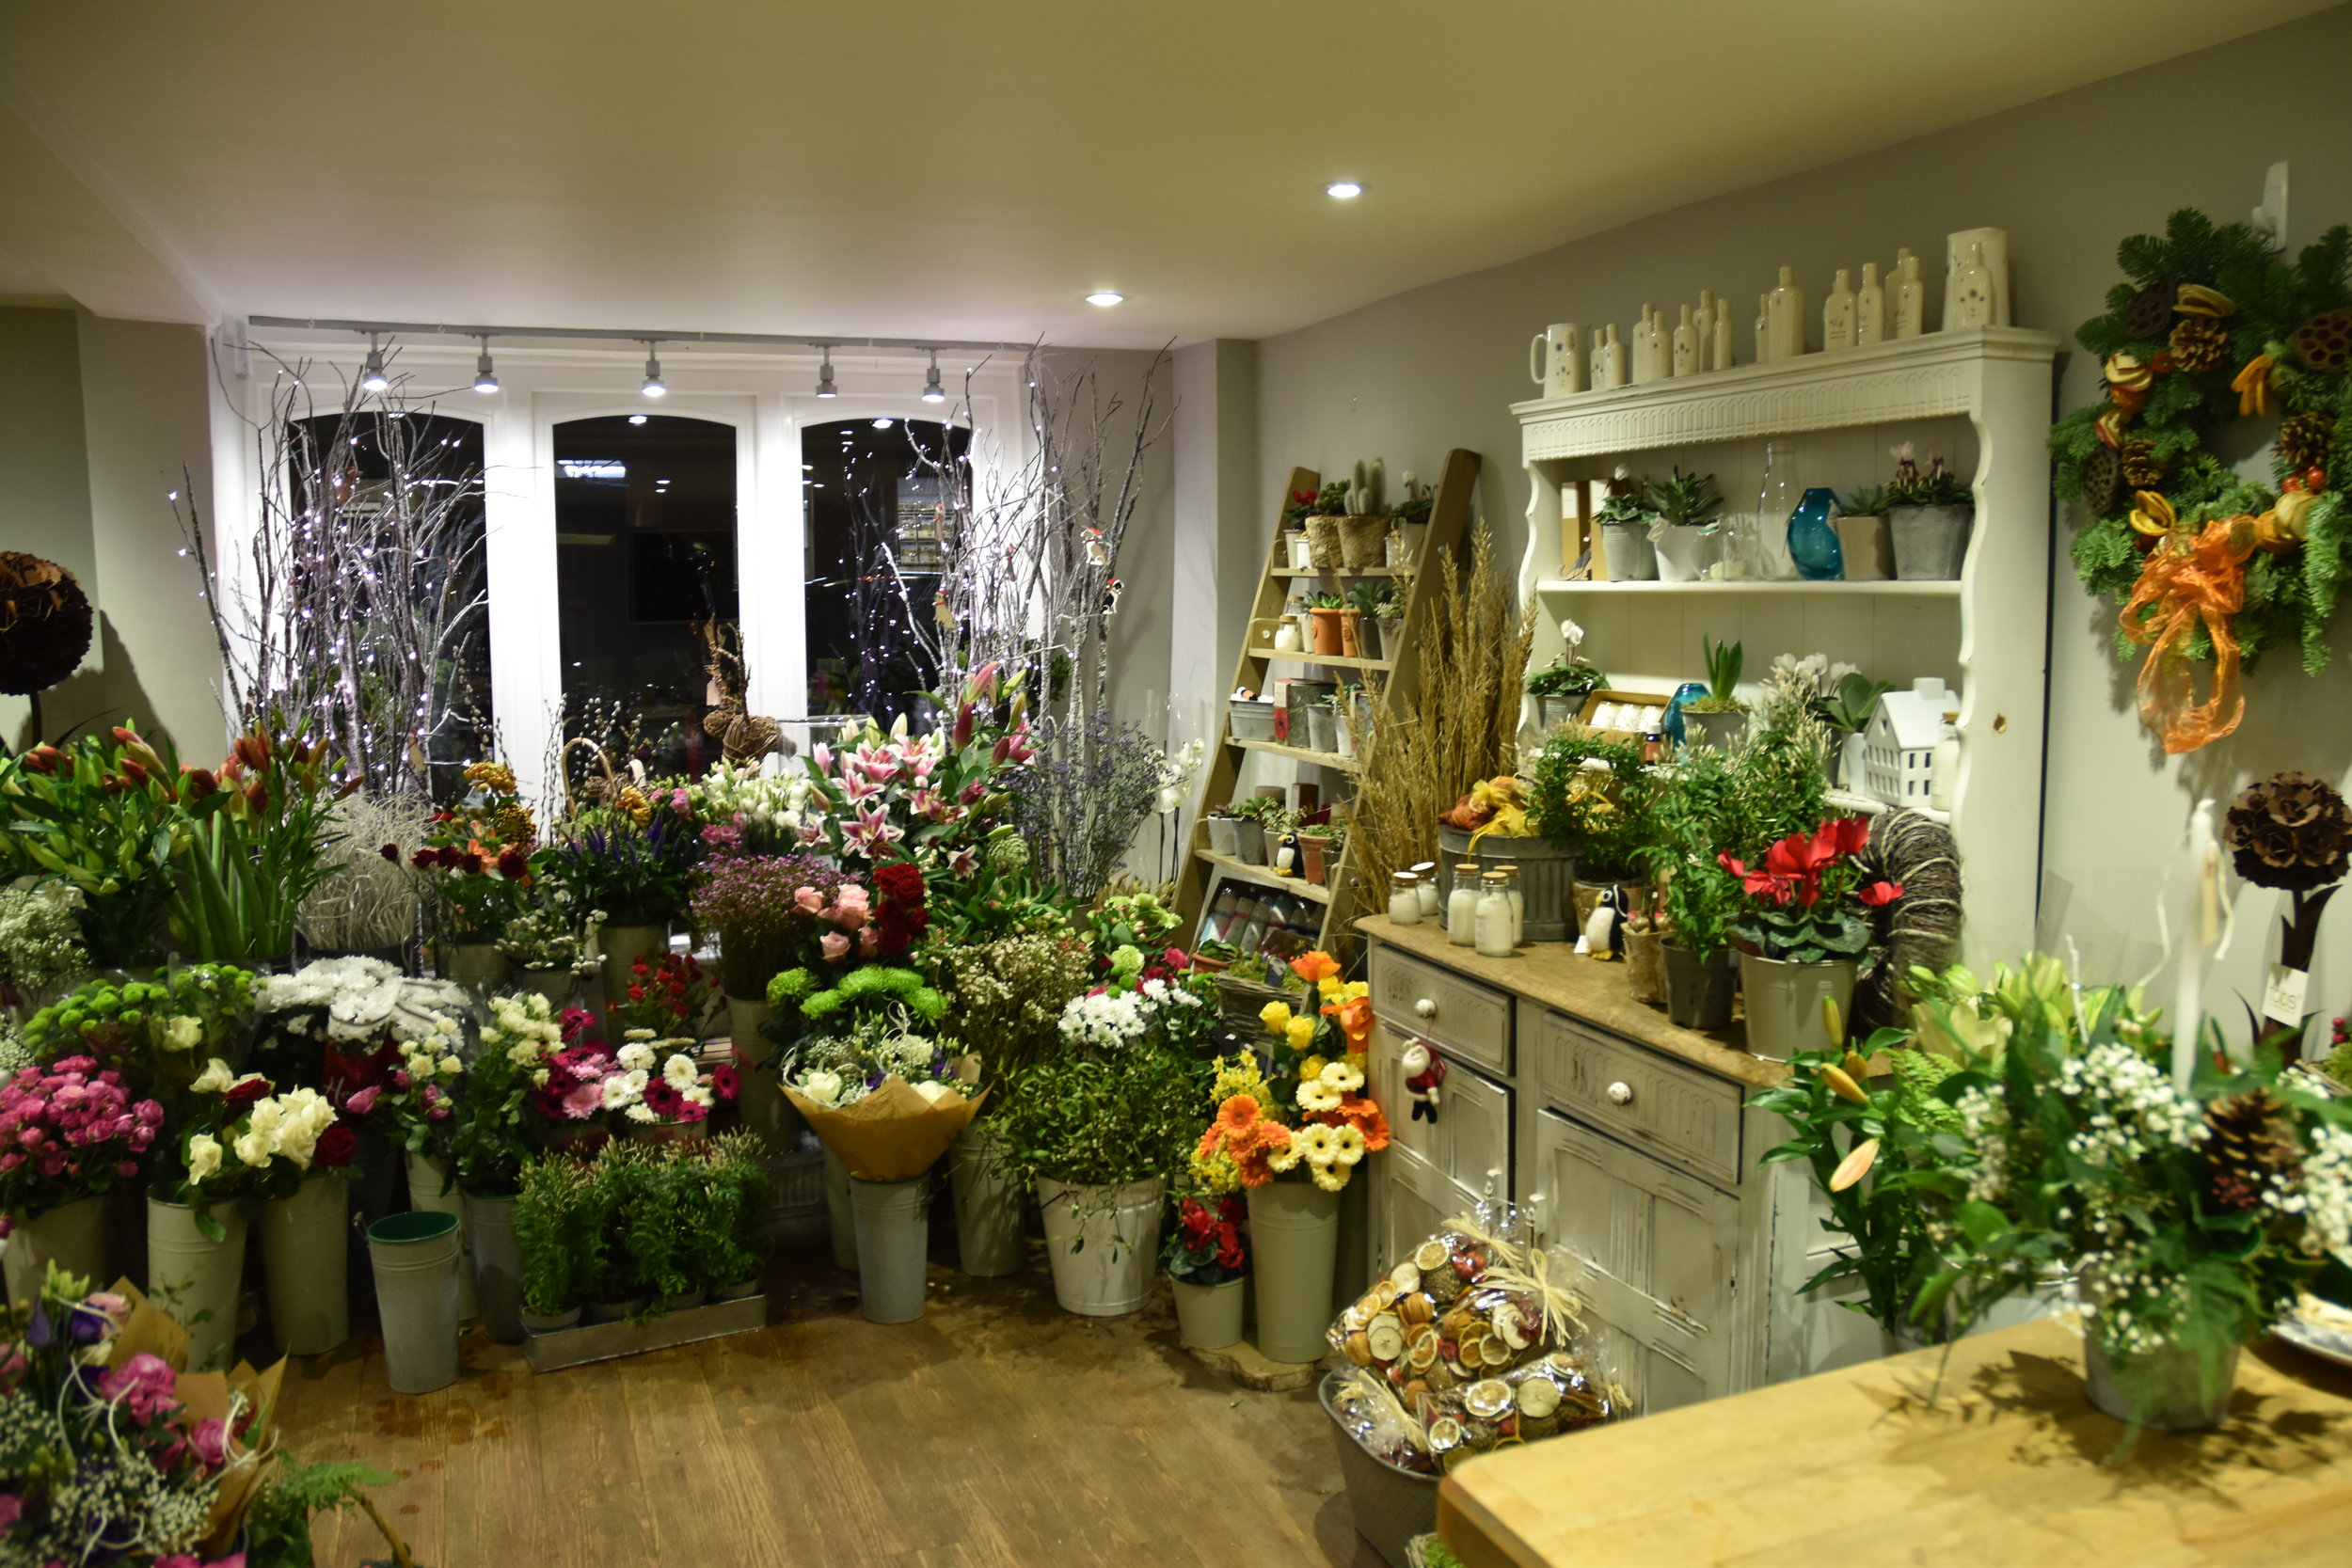 Inside the flower shop in Alresford